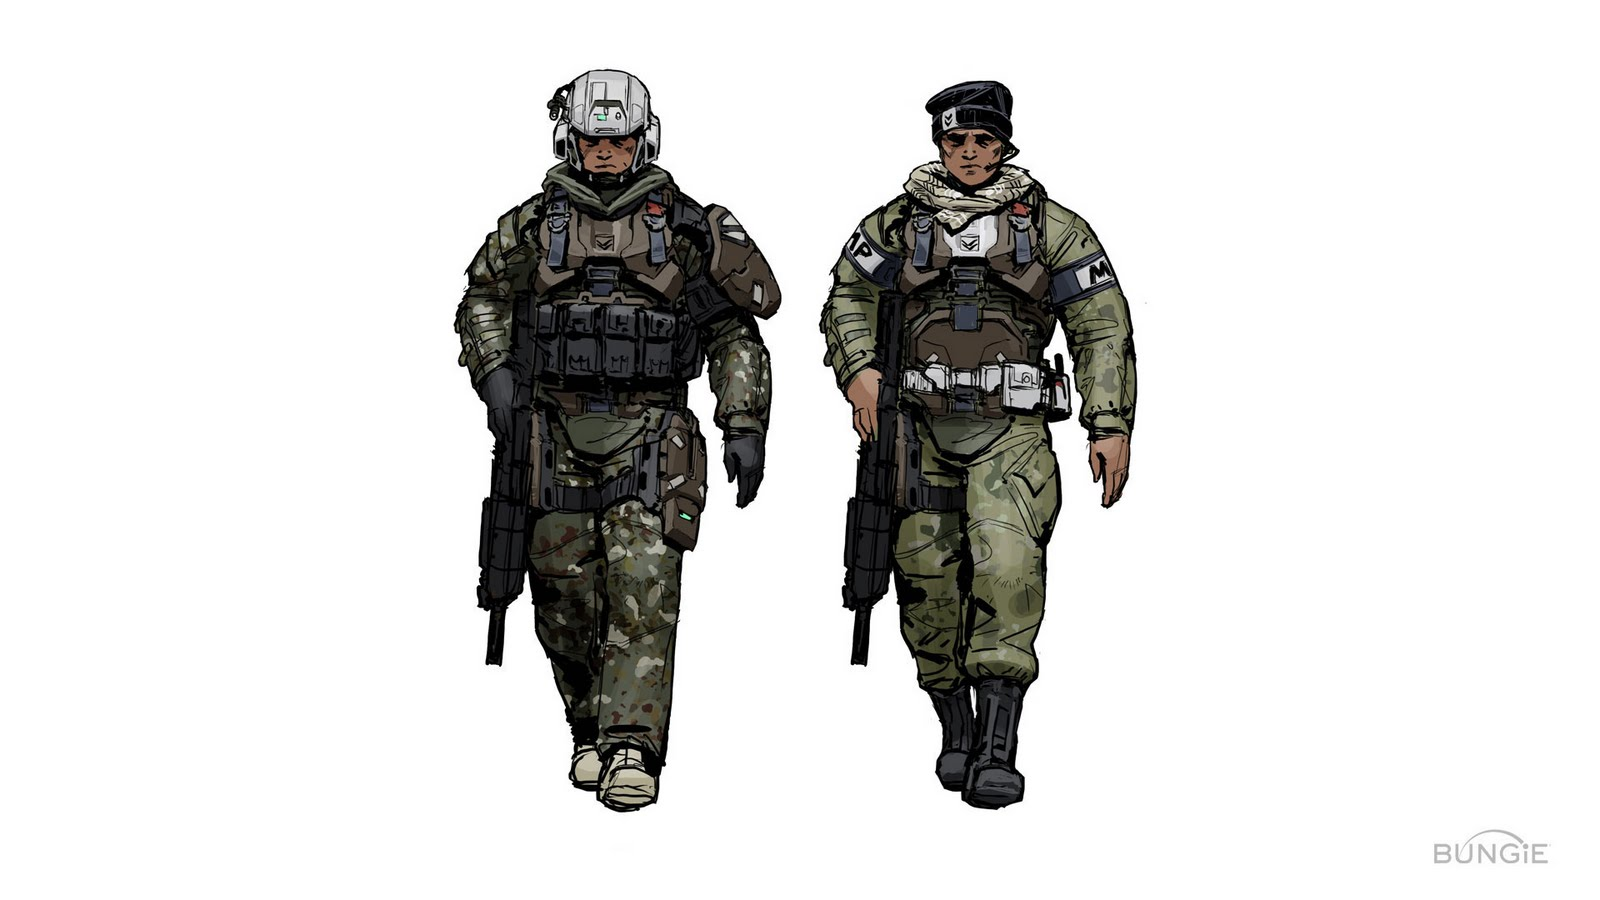 Unsc Marines Halo 4 Halo Unsc Marine Concept Art